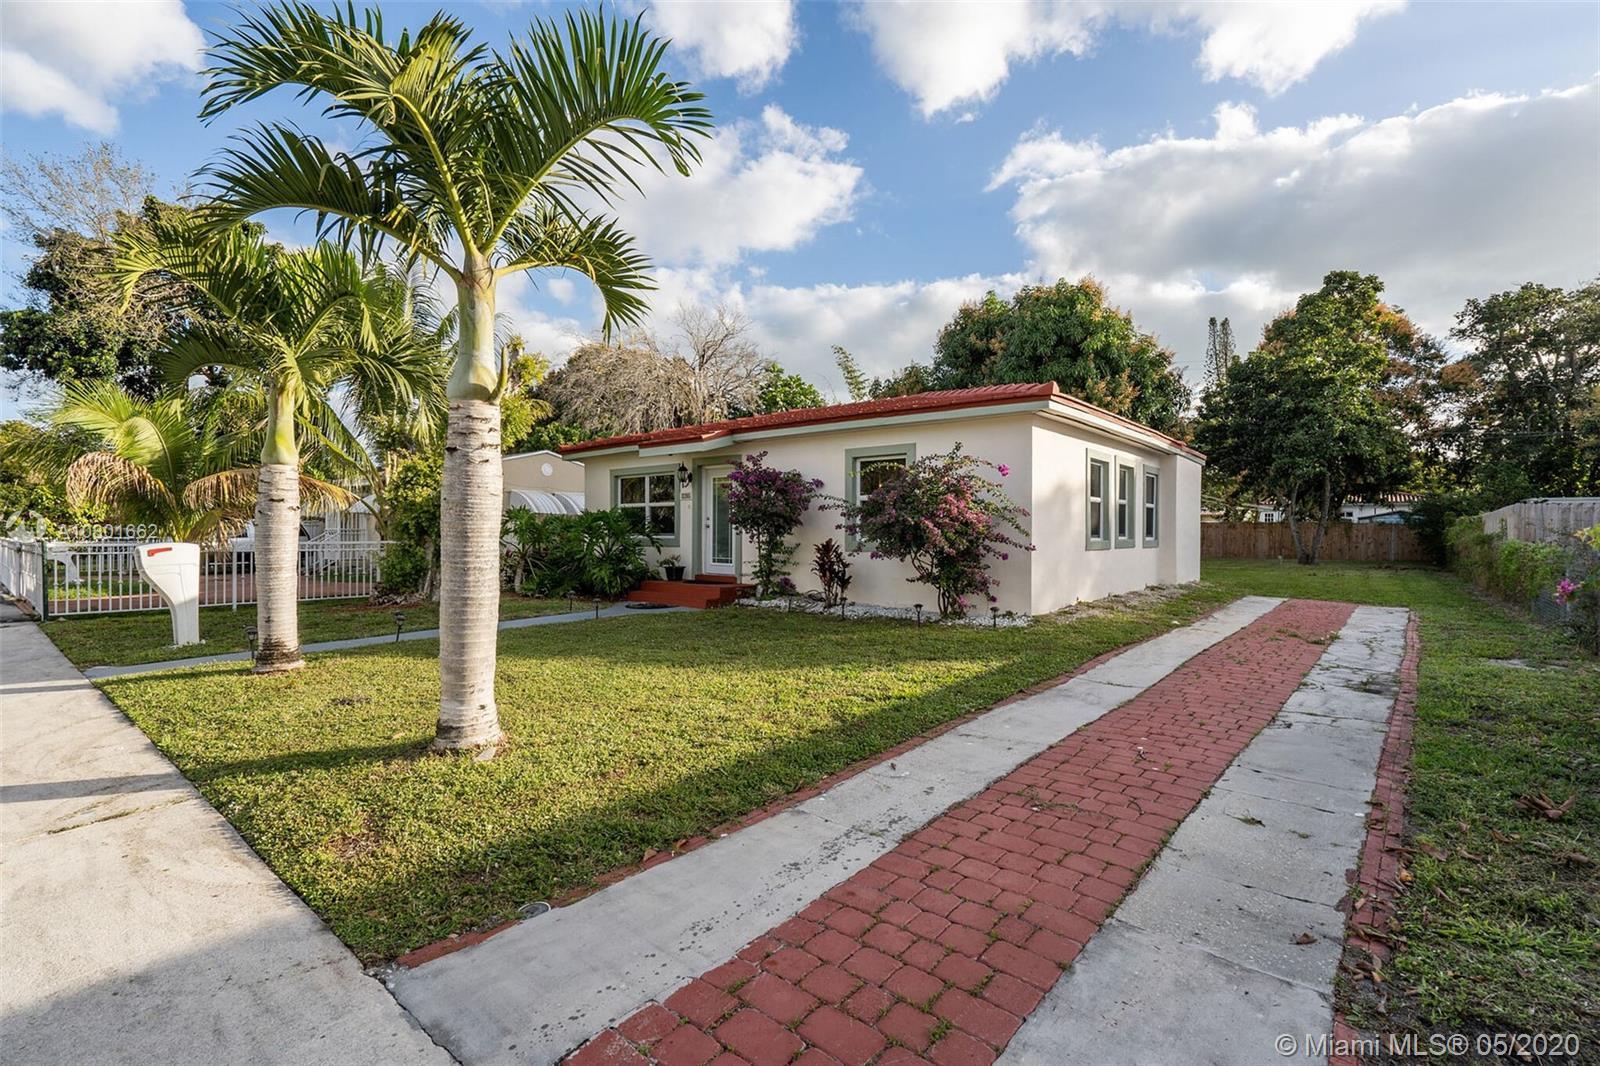 12205 NE 11th Ct, Miami Shores, Florida